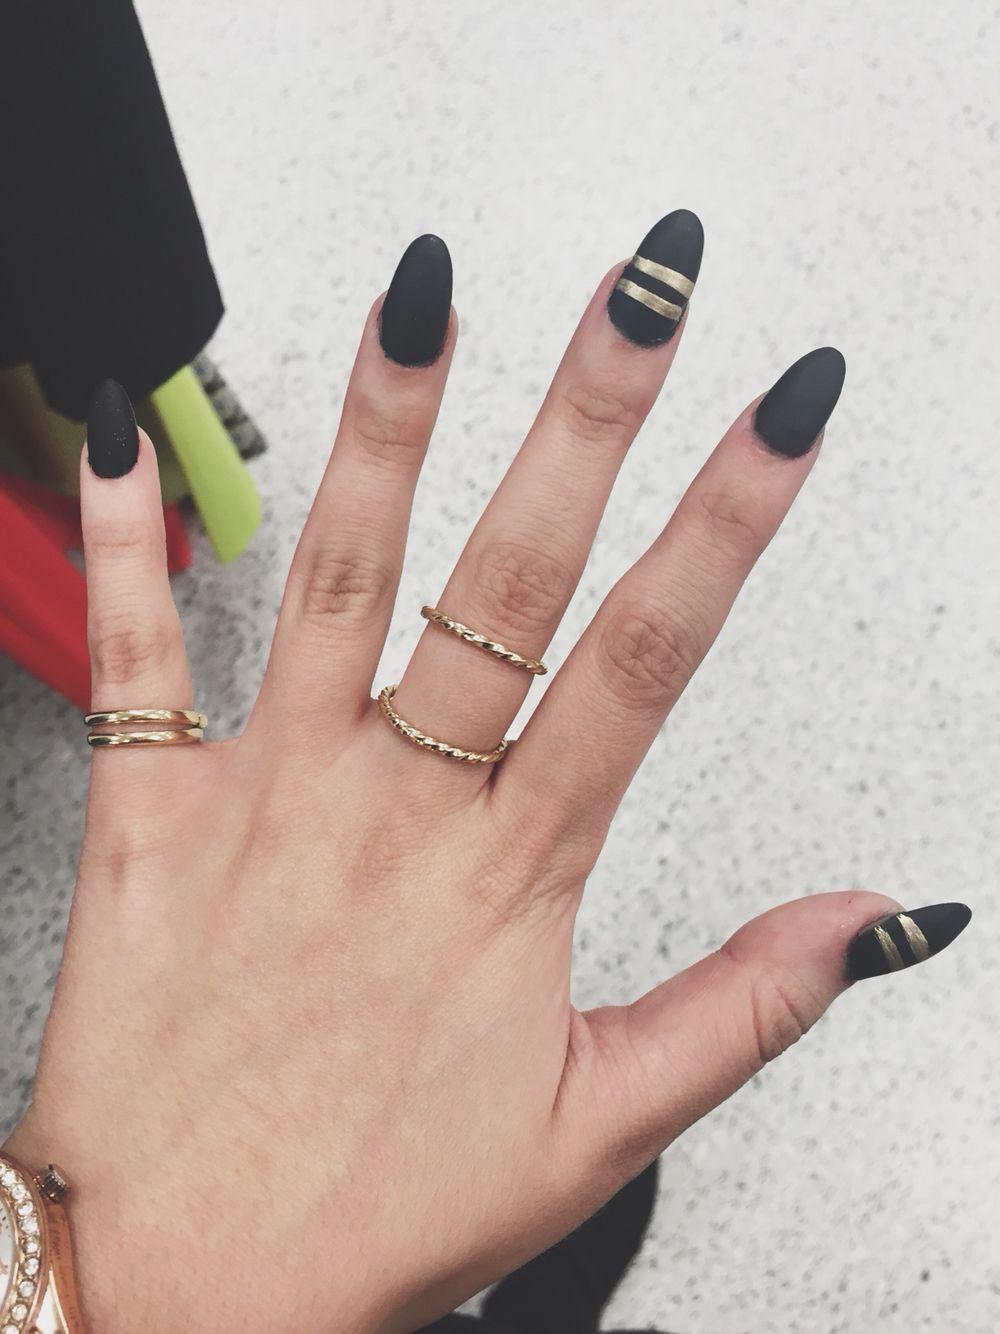 Matte black almond nails | Nails & Beauty | Pinterest | Black almond ...